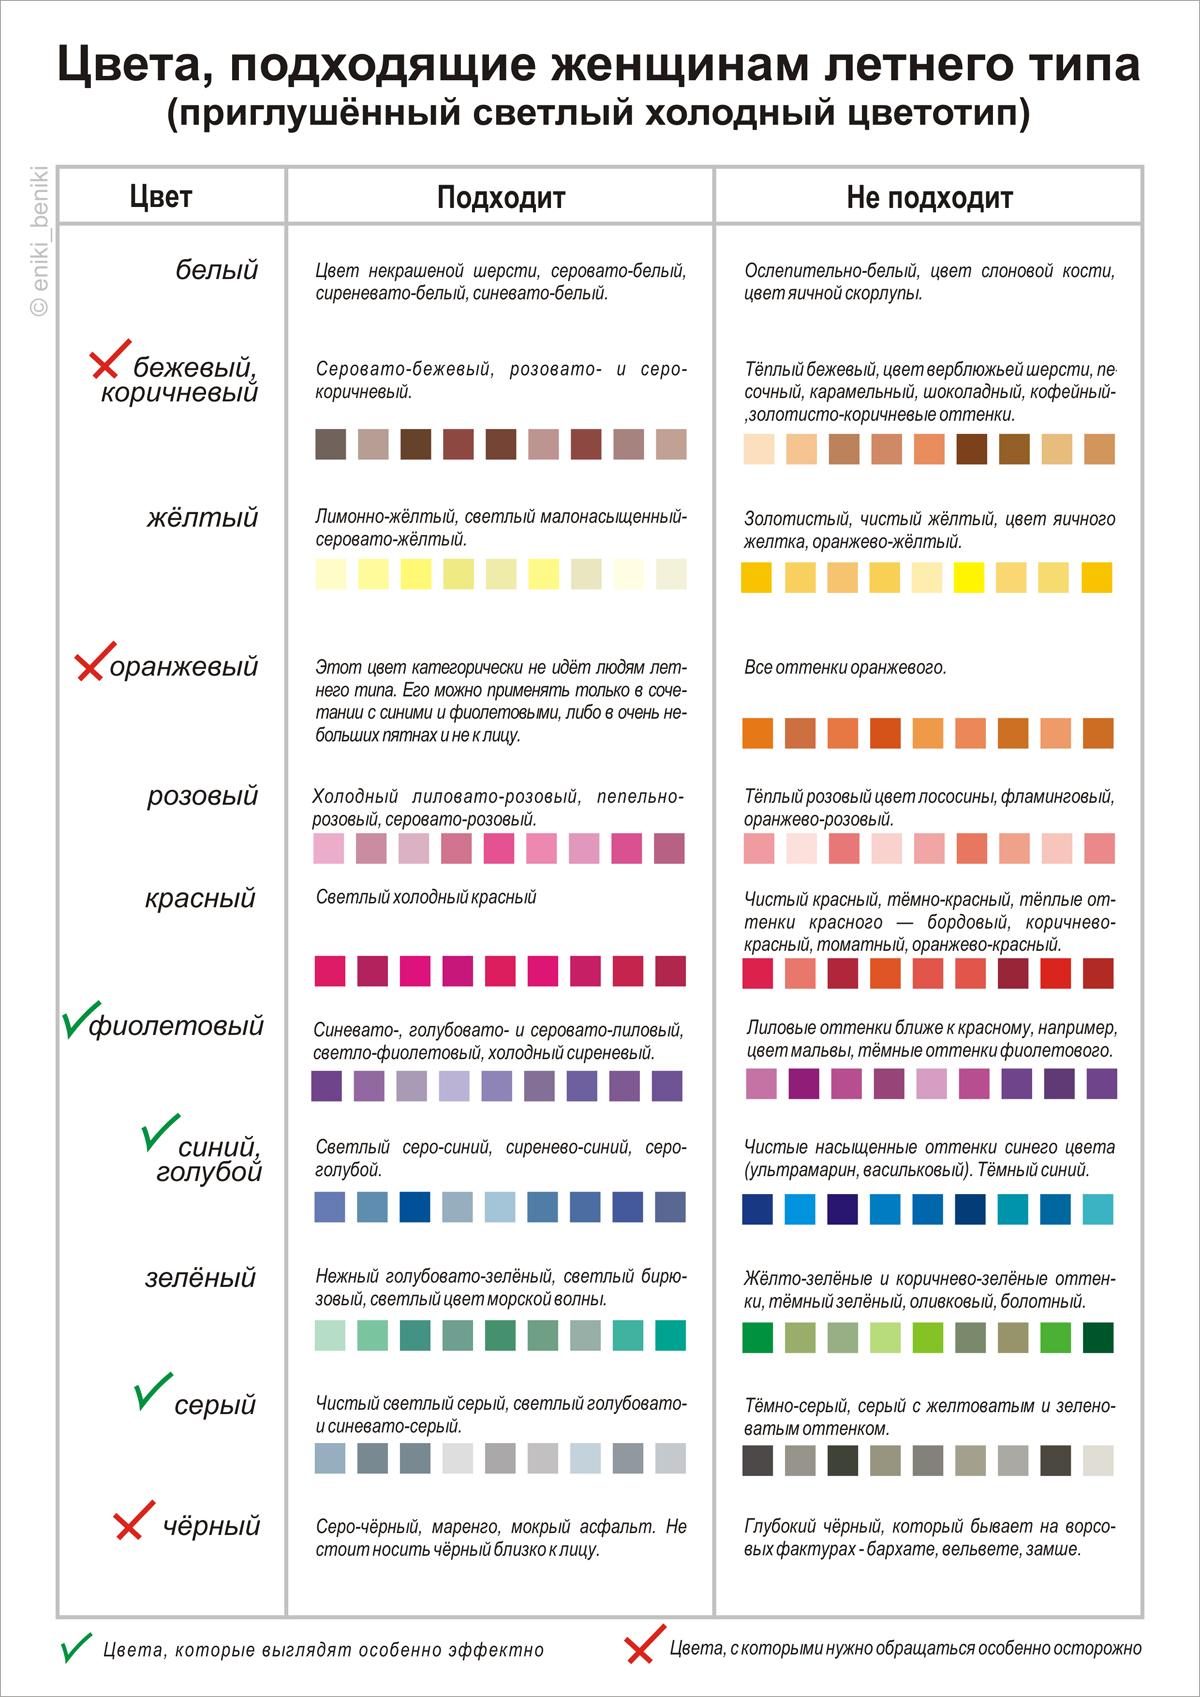 Цветовая политра для цветотипа зима